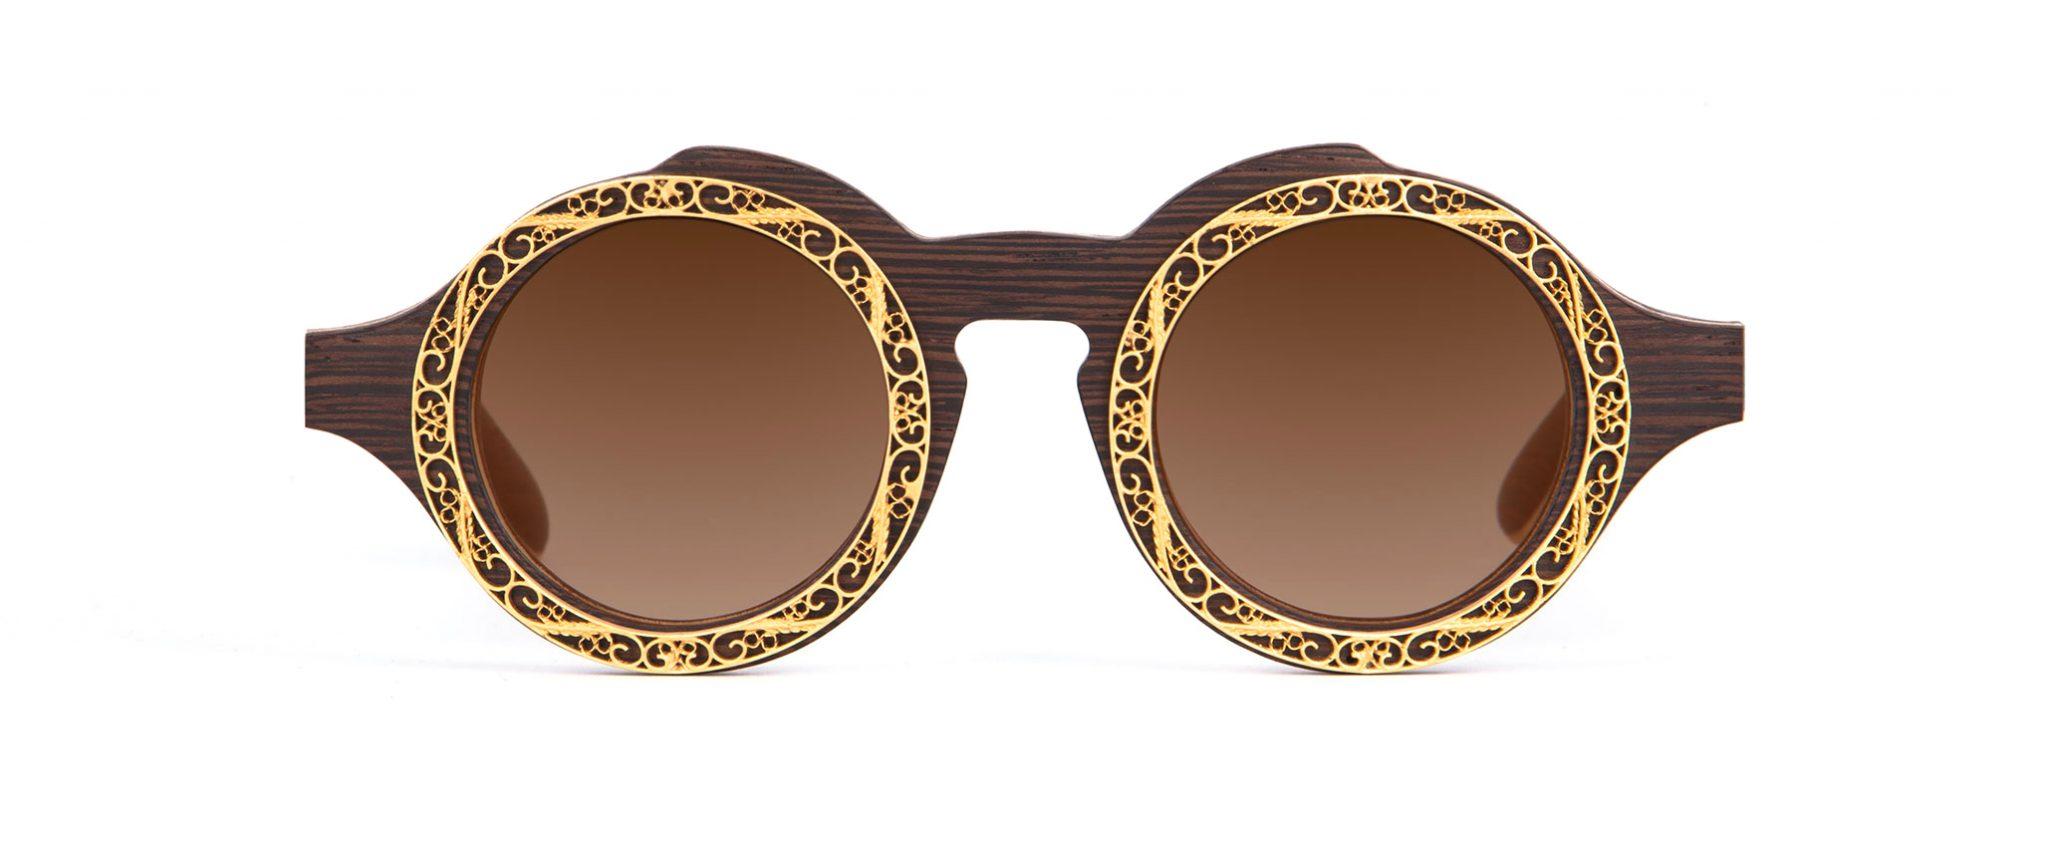 Lella Wenge Round Designer Sunglasses Featuring Jewelry